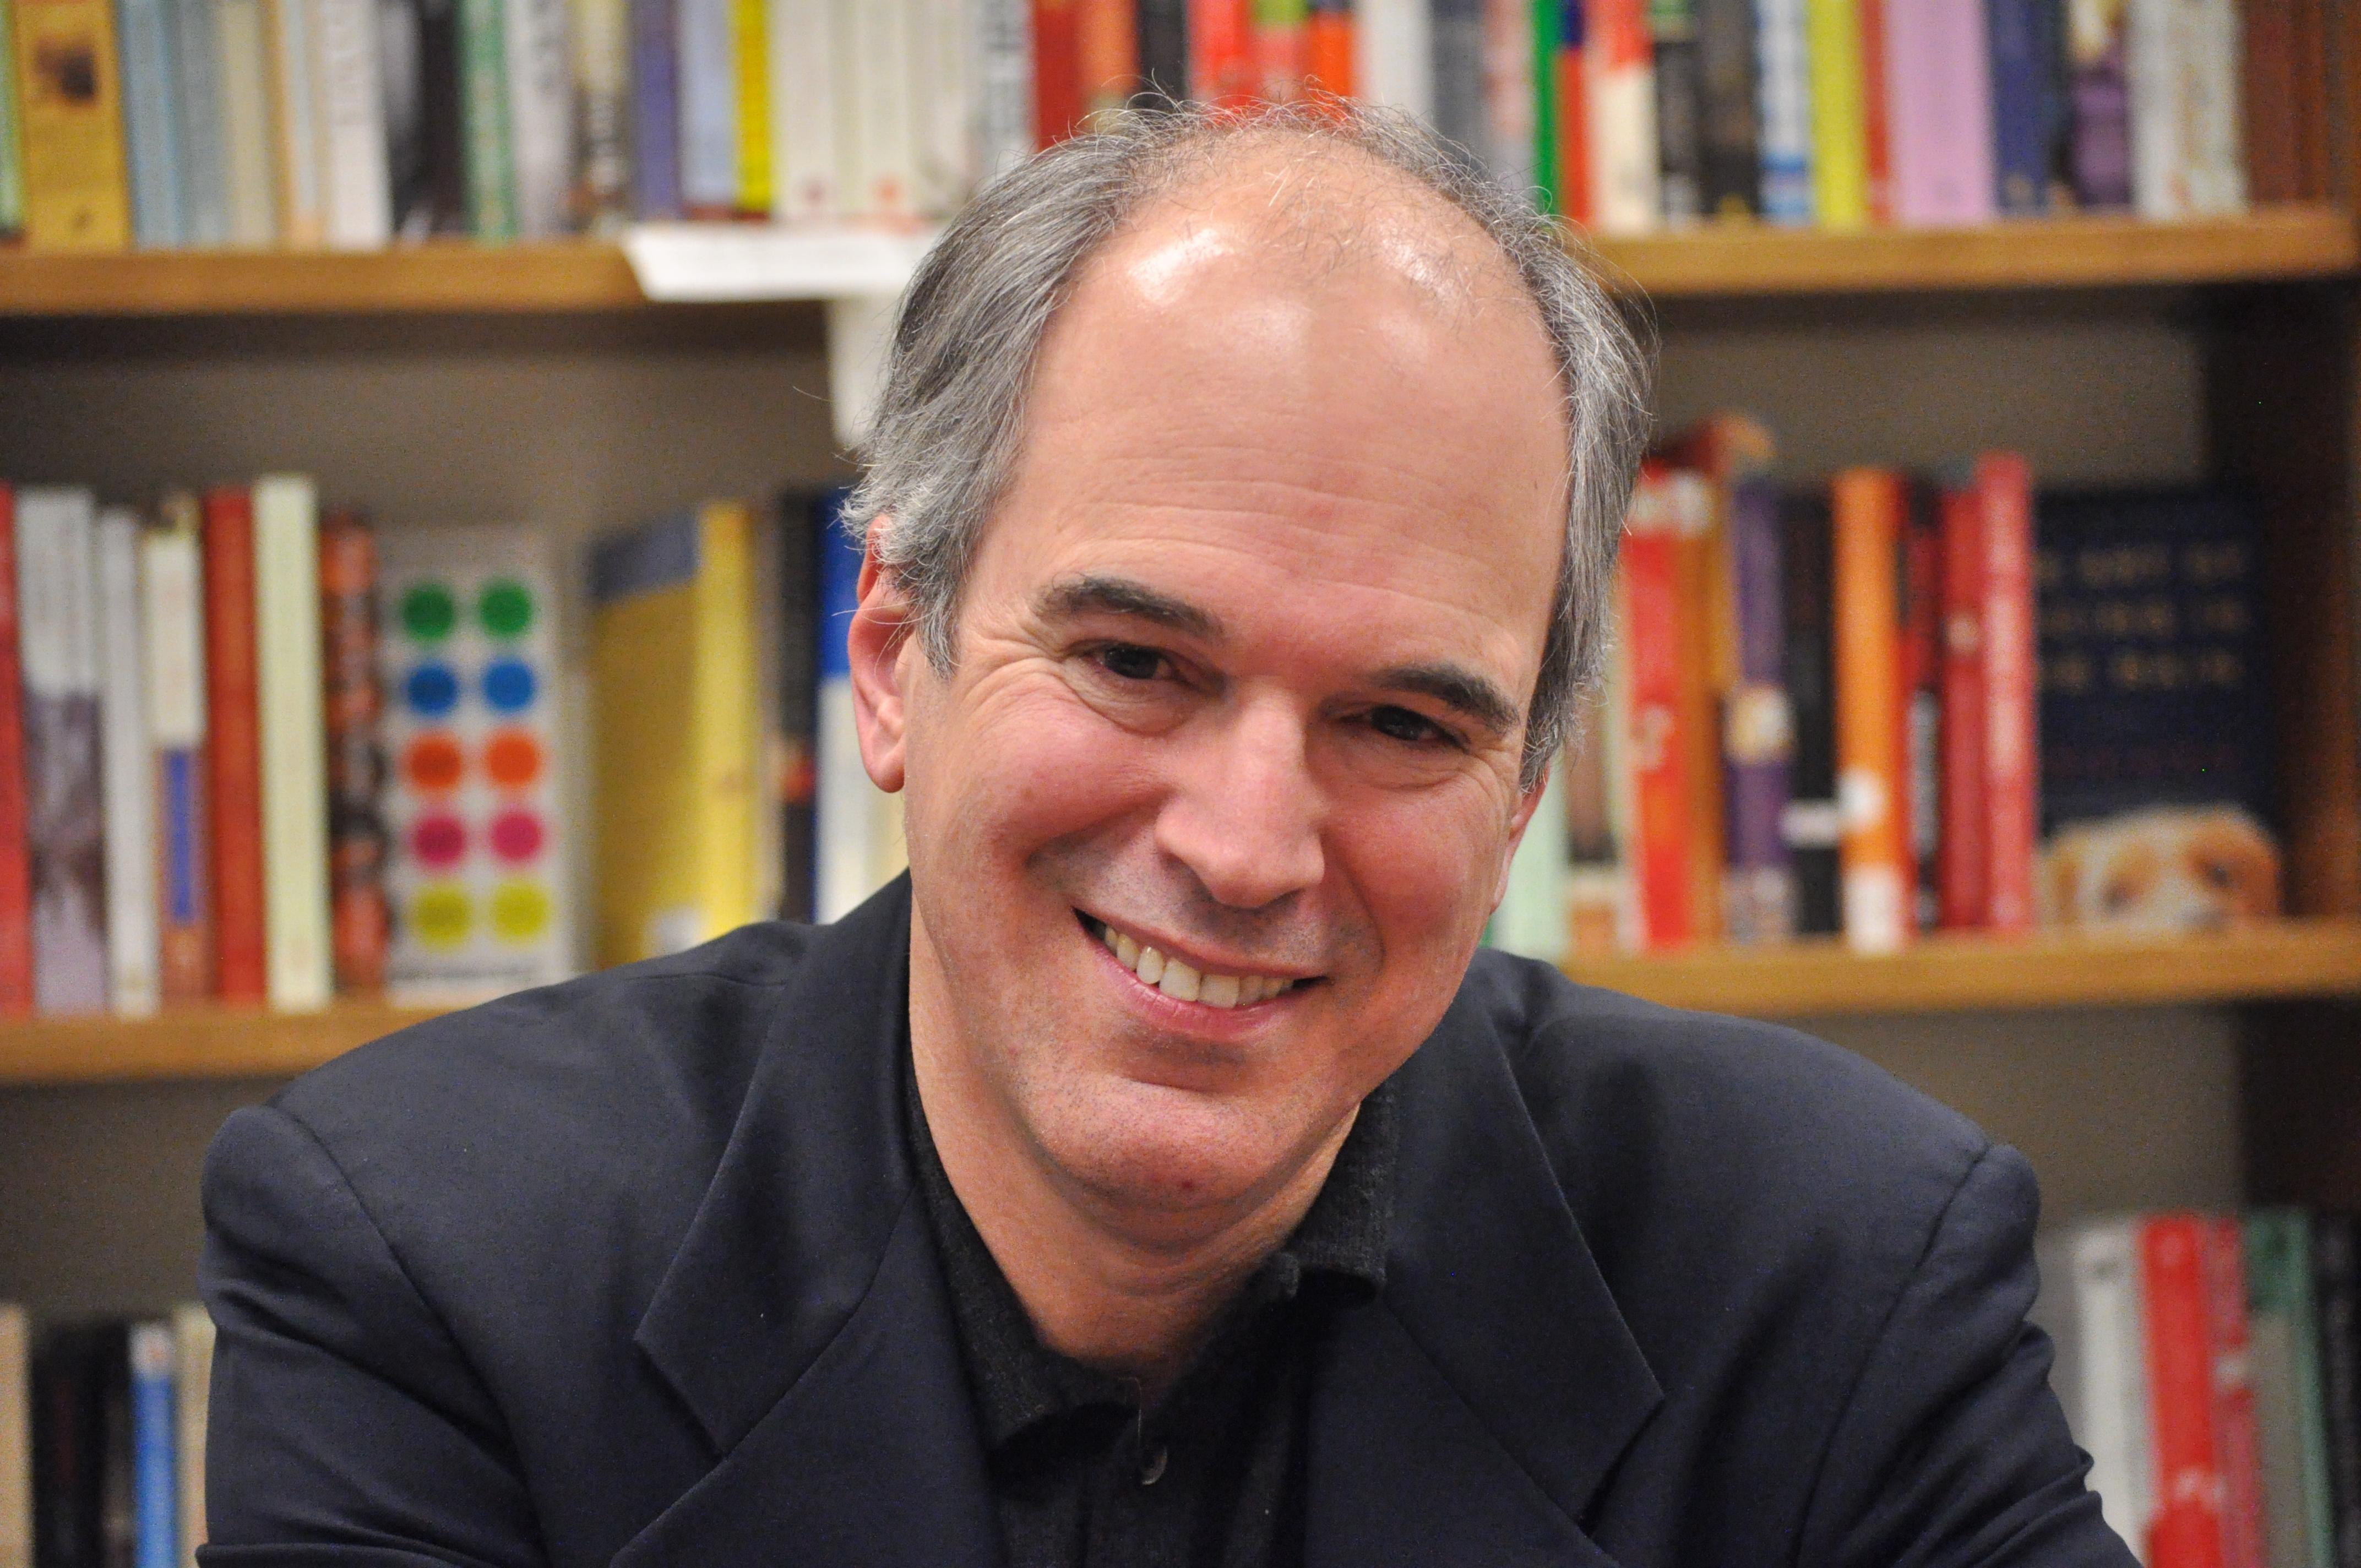 Peter Lerangis